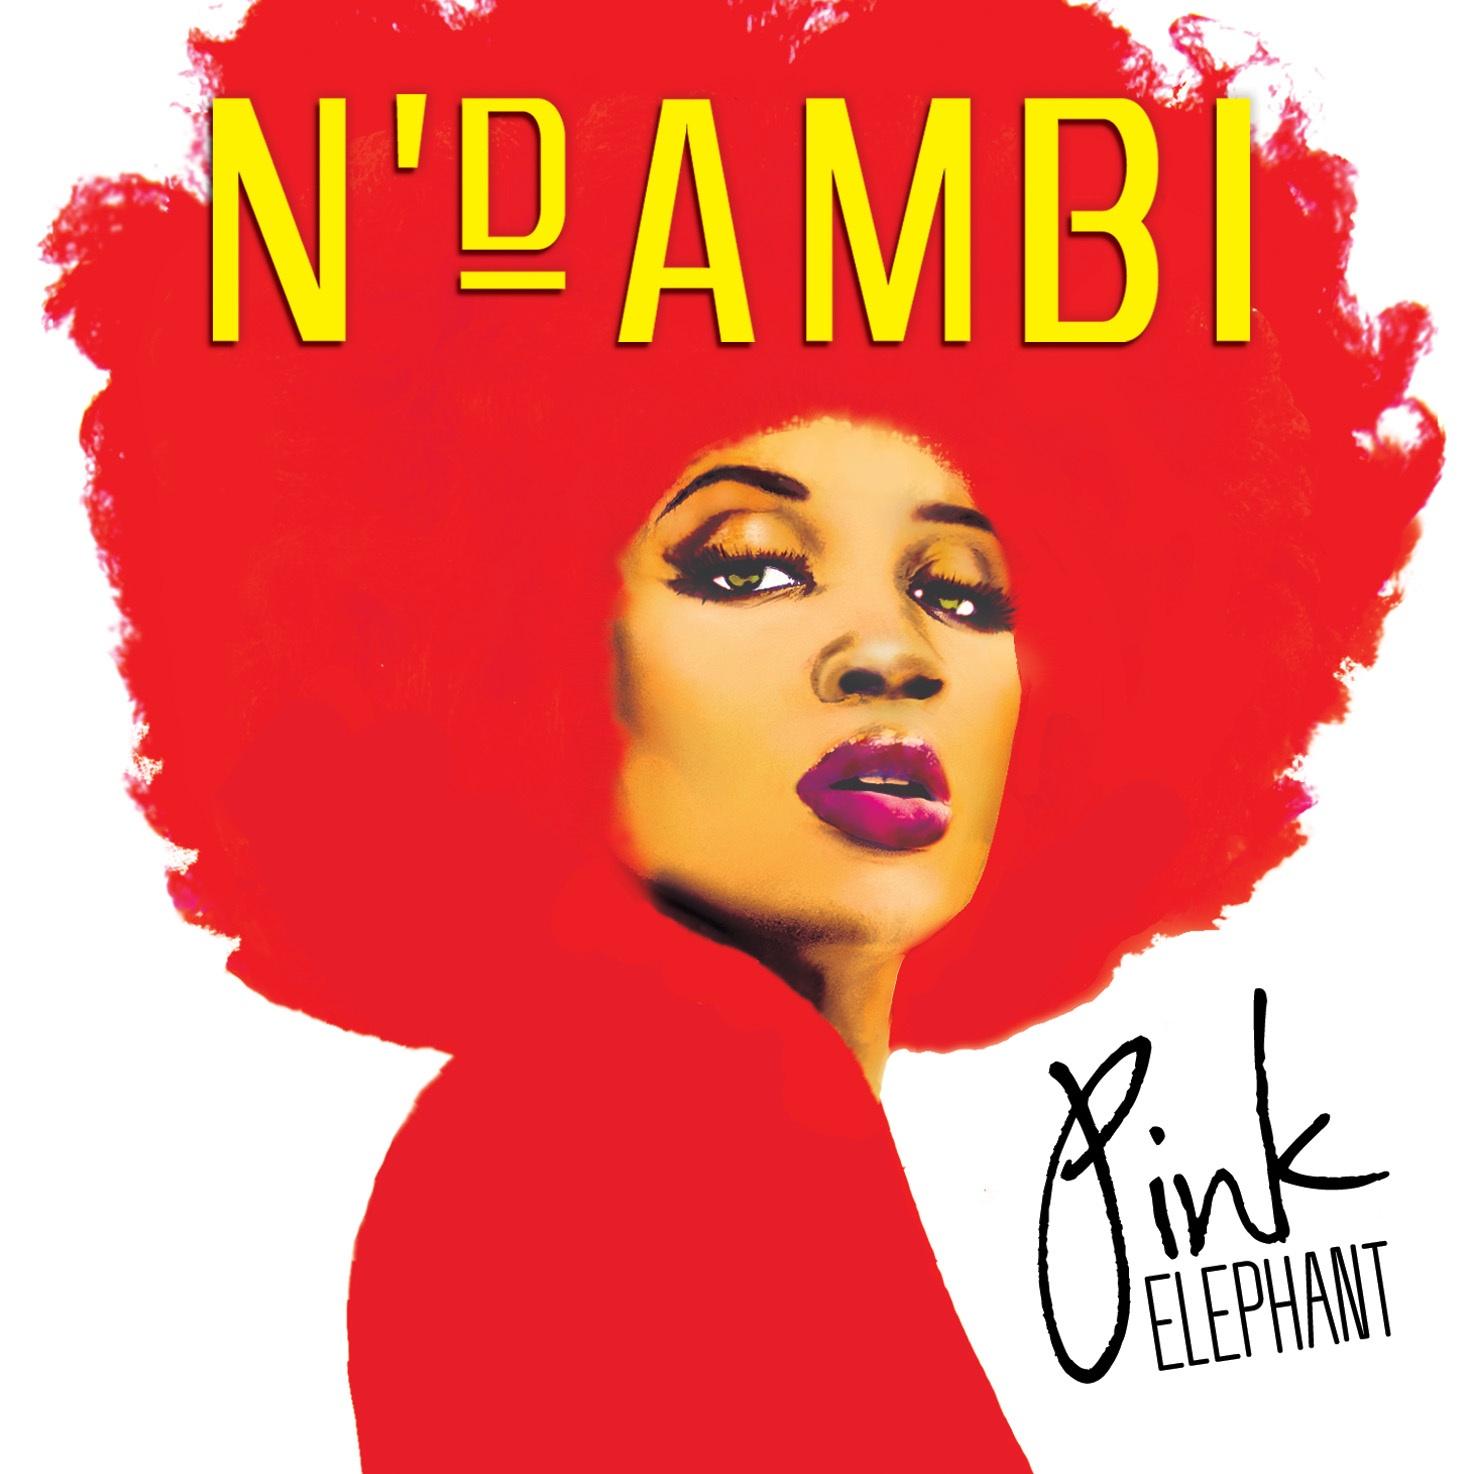 NDAMBI_PinkElephant_Cover_HI RES copy 2.JPG